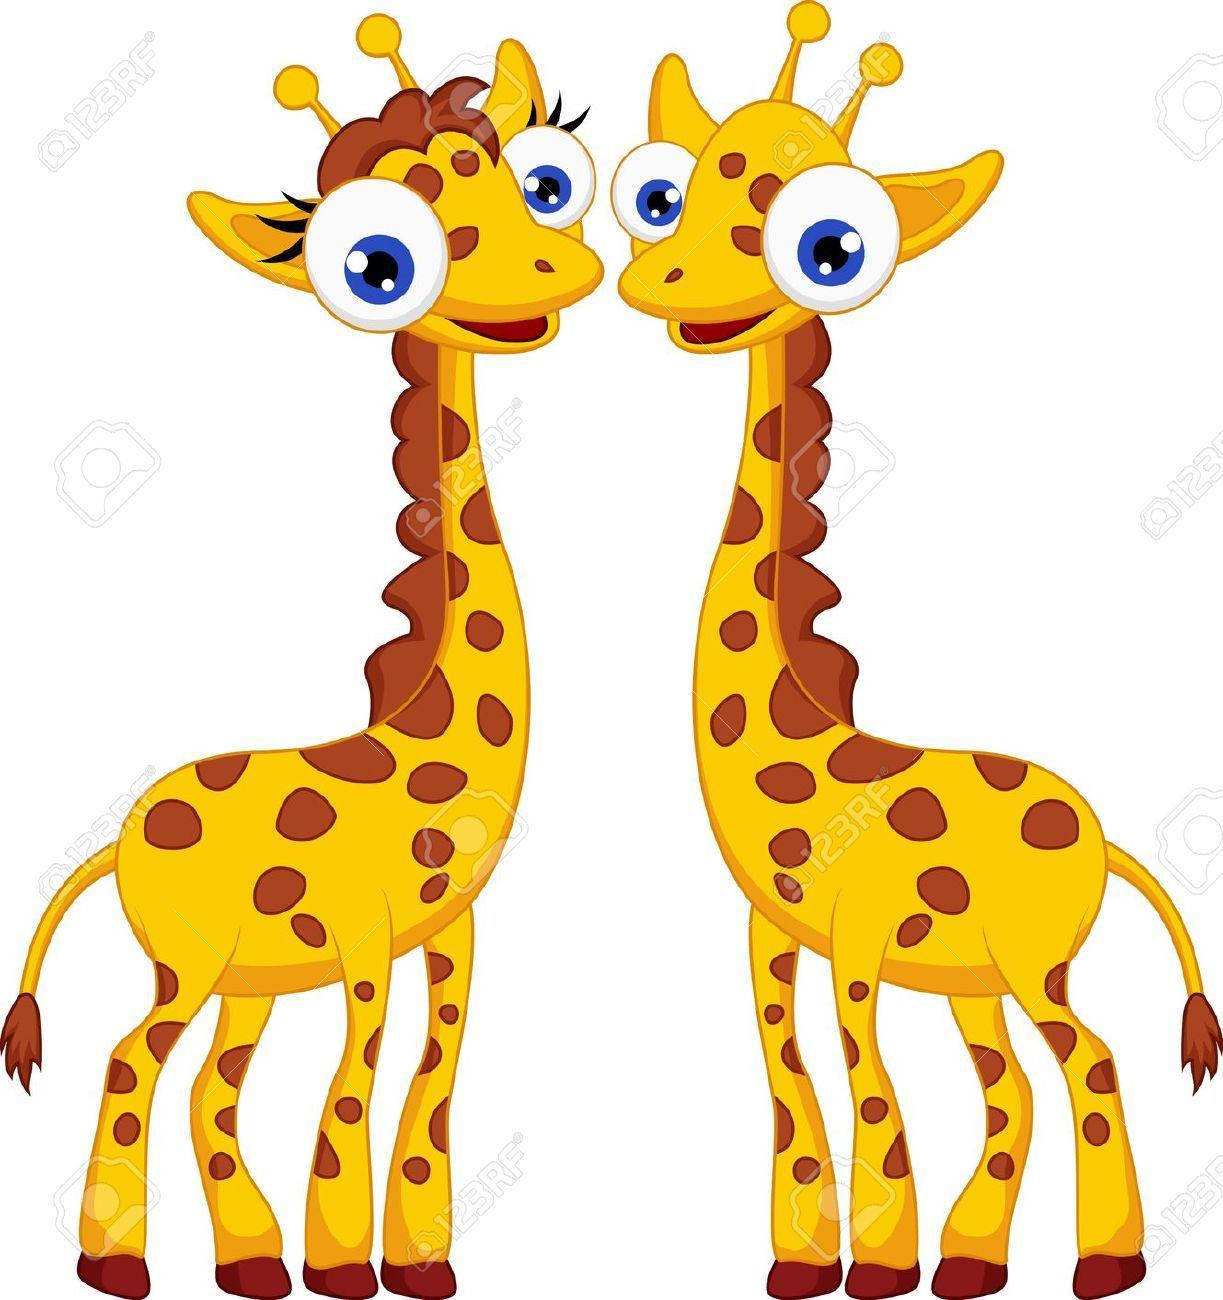 giraffe stock vector illustration and royalty free giraffe clipart rh pinterest com free giraffe cartoon clipart free cute giraffe clipart